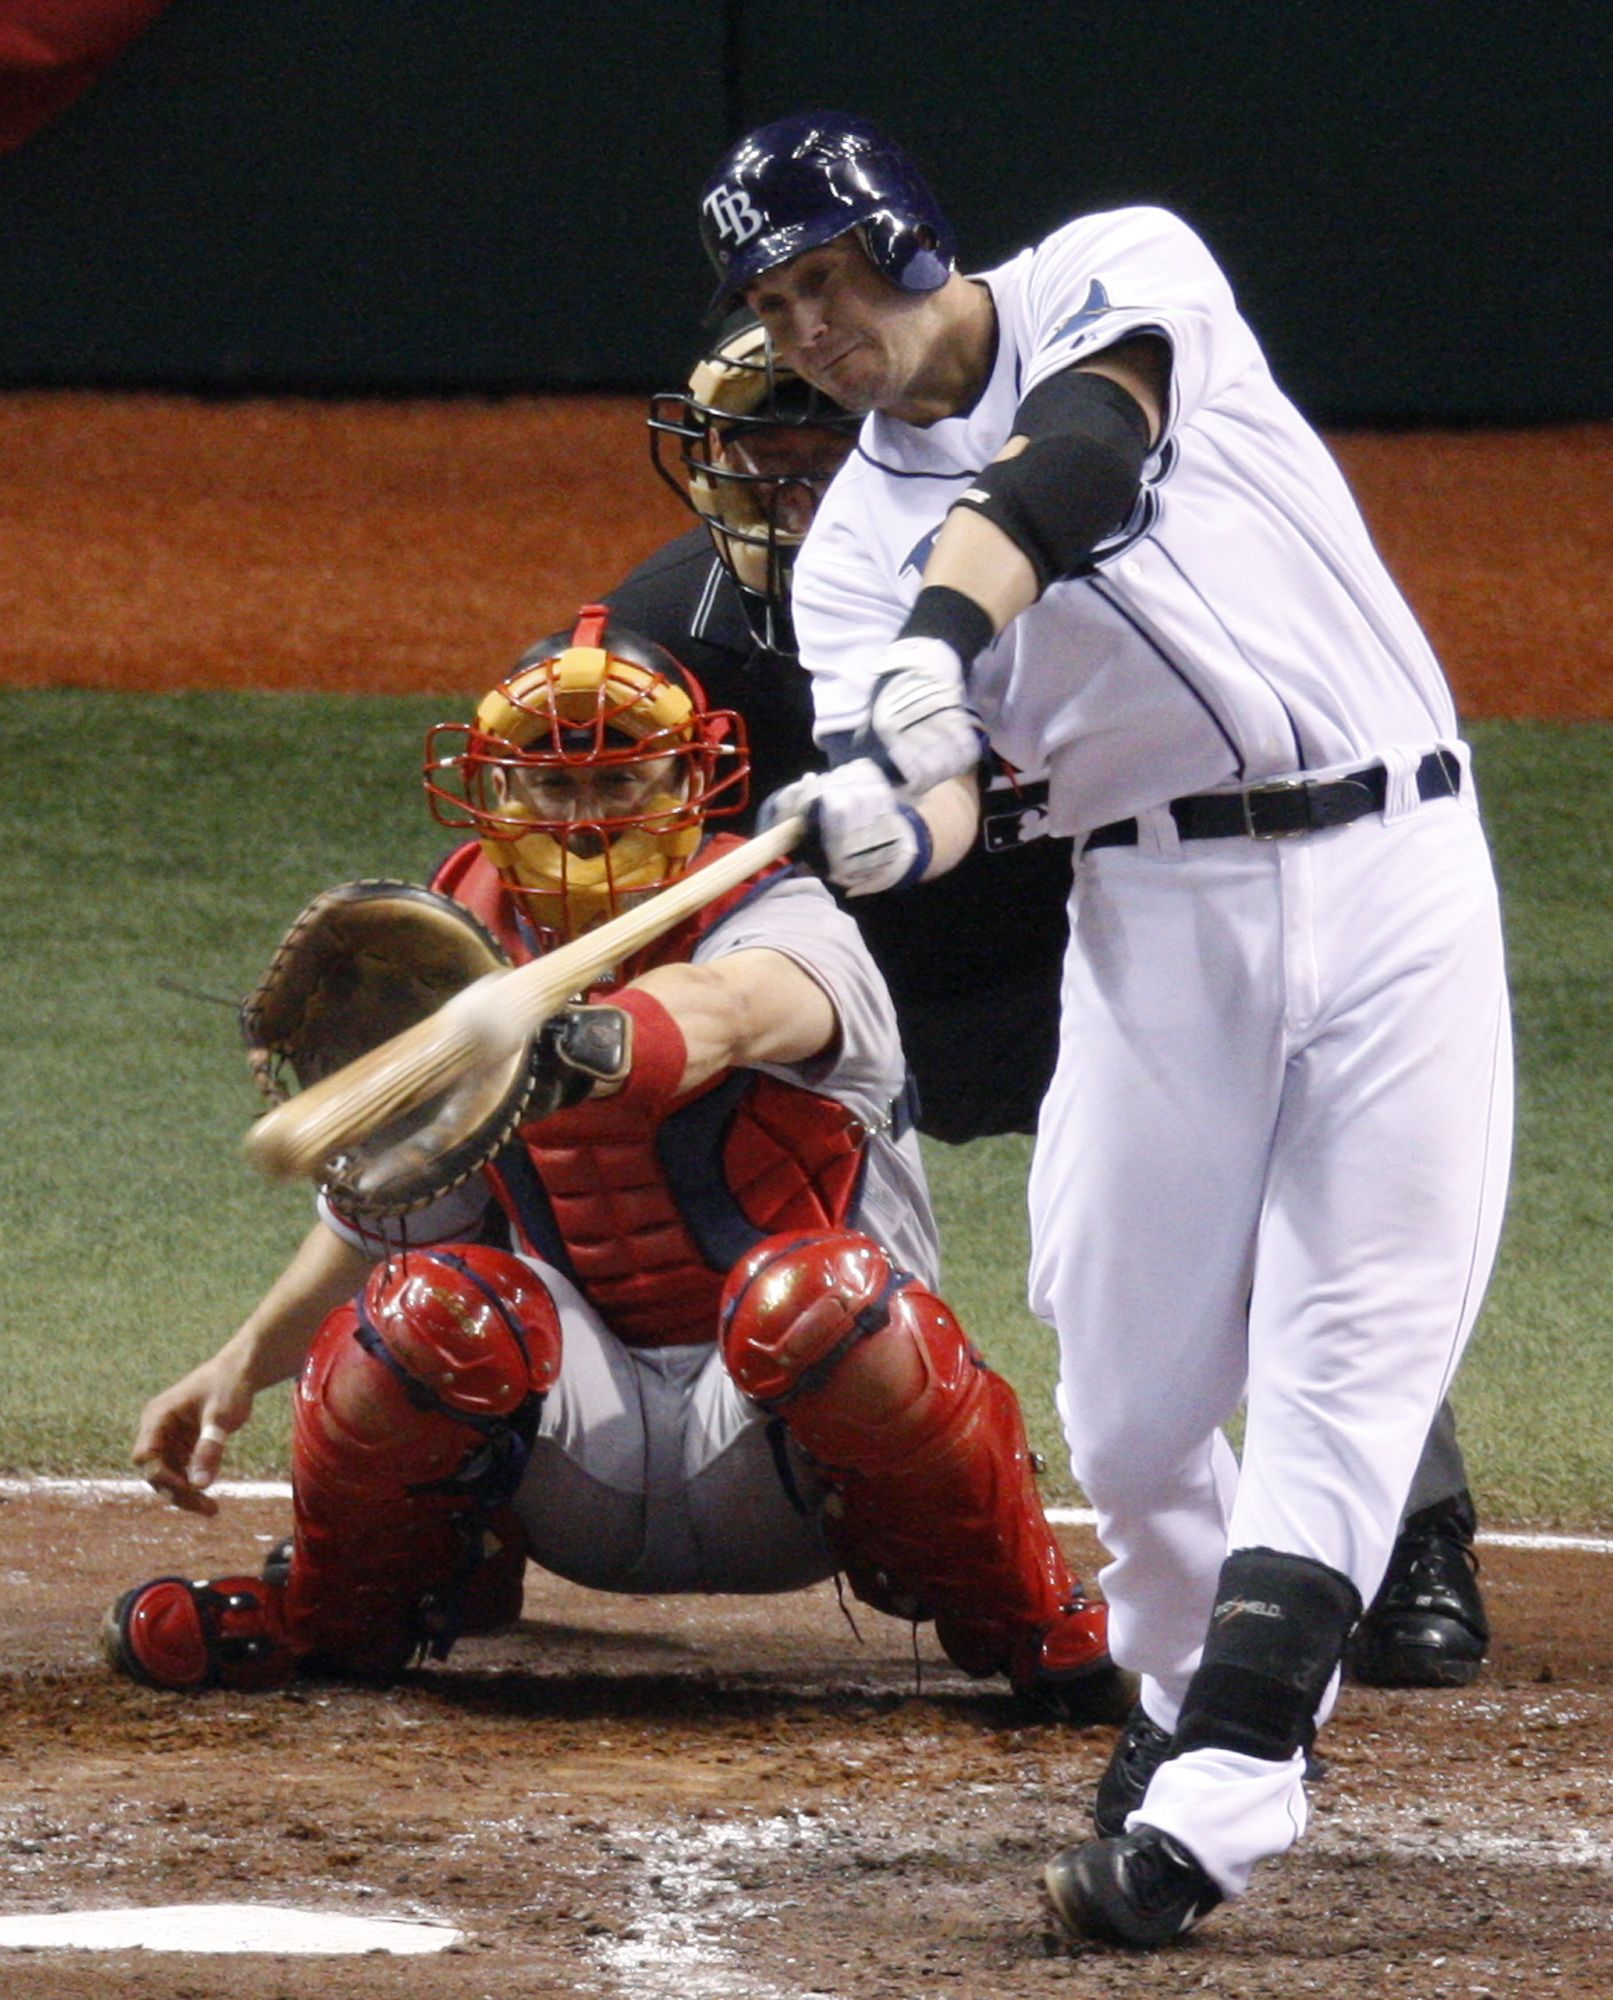 Like hitting a home run!!!! Sports talk radio, Baseball